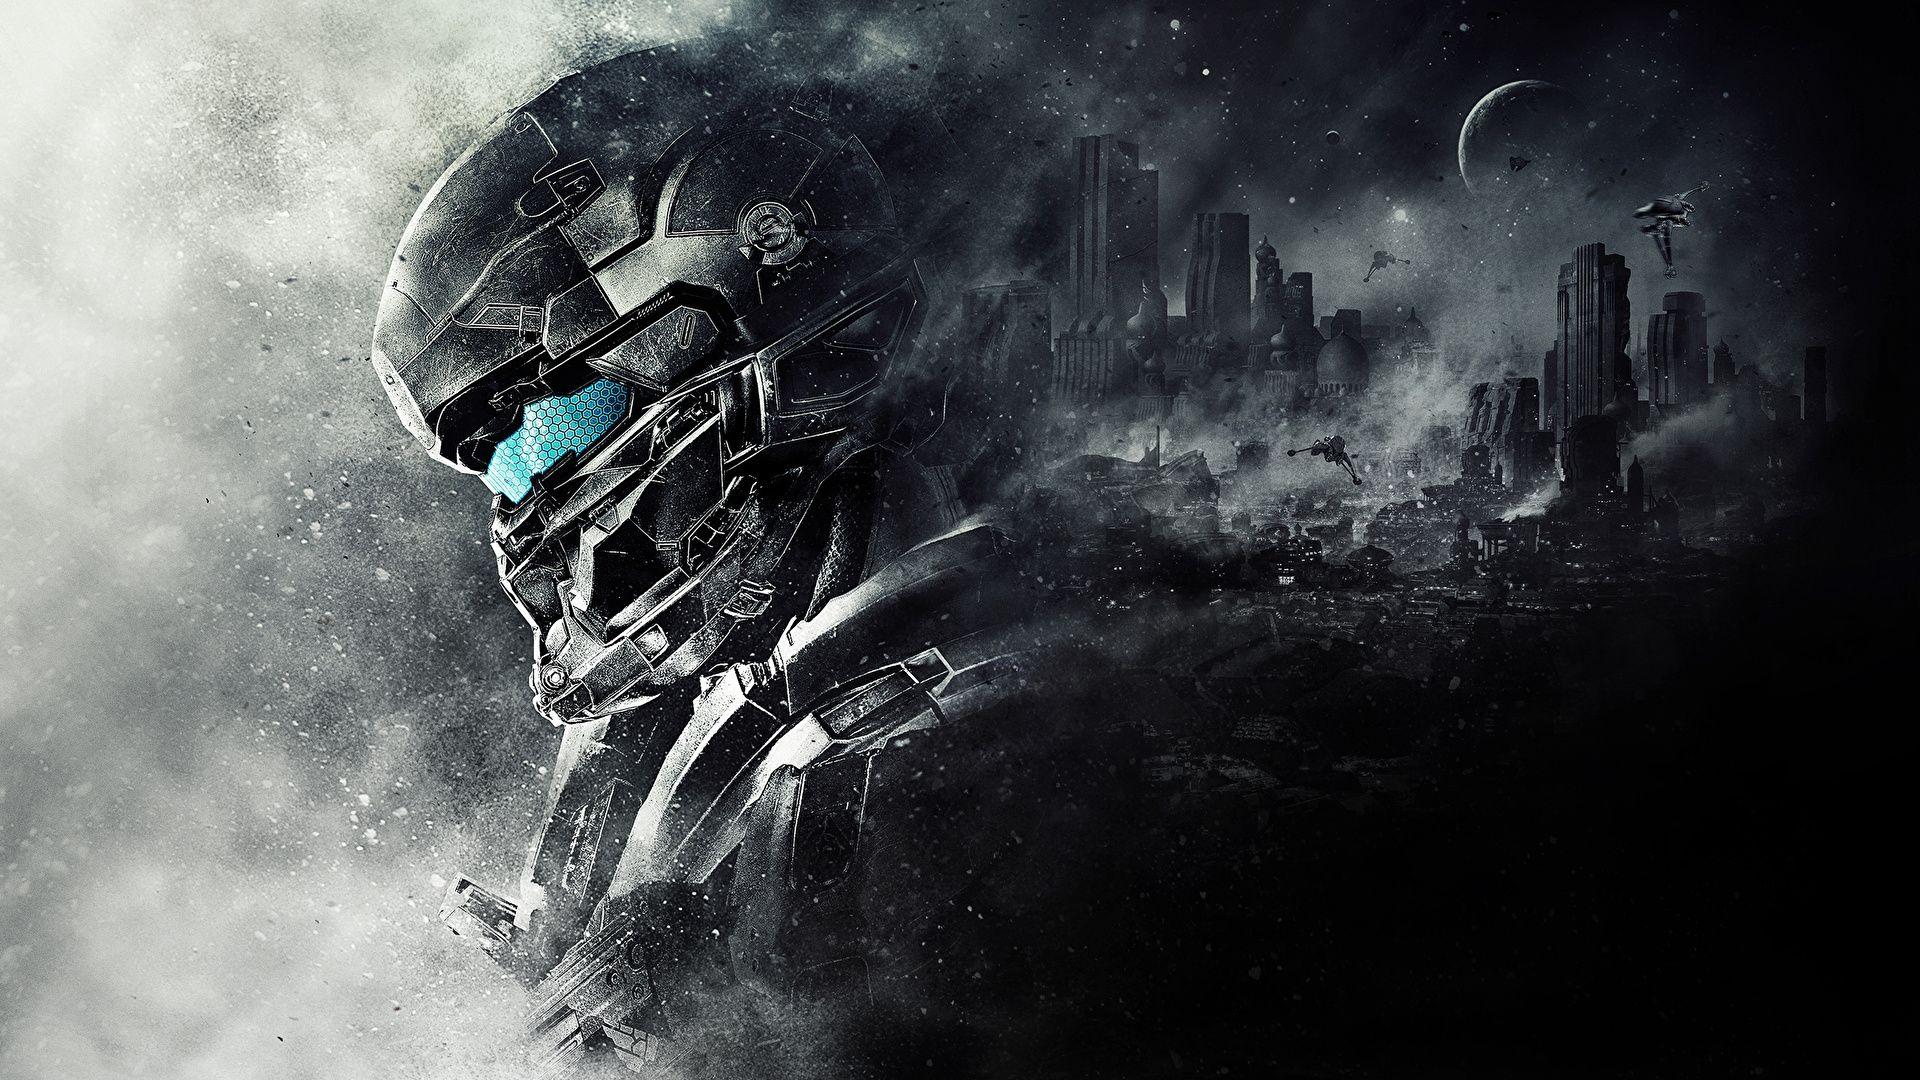 Halo Halo Guardians Industries Microsoft Helmet Games Fantasy Photo